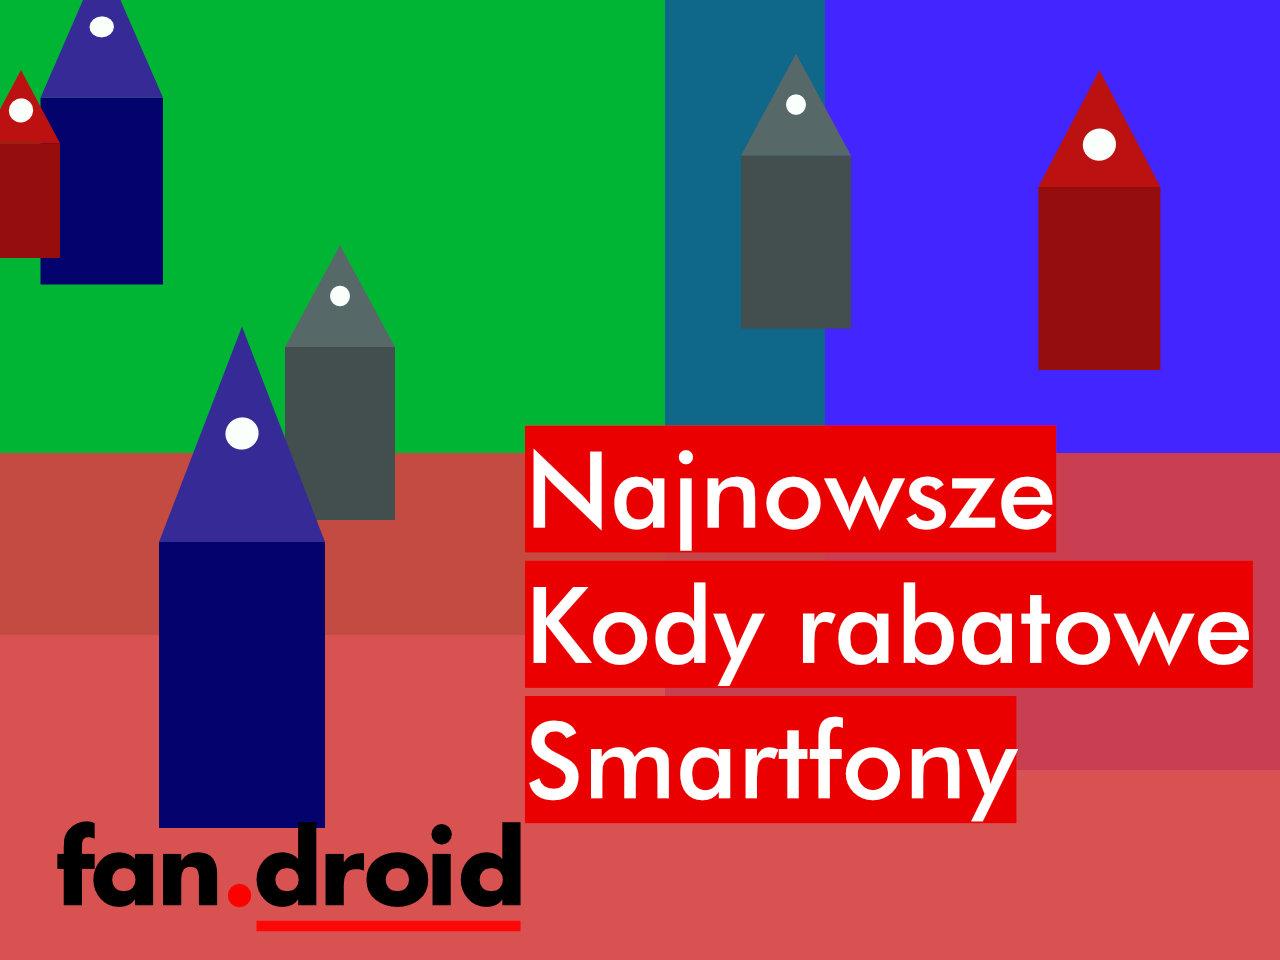 https://www.fandroid.com.pl/wp-content/uploads/promocje-sale-sklep.jpg